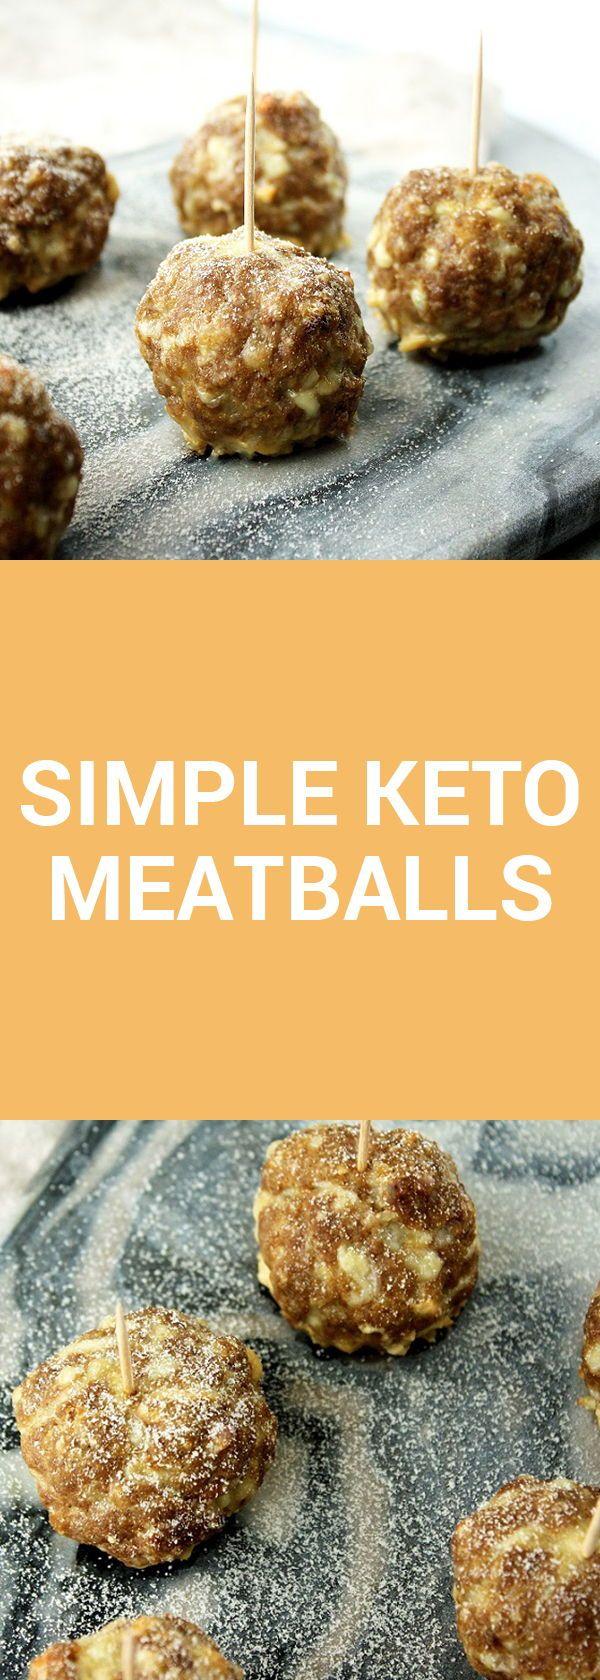 Simple Keto Meatballs | Keto Diet Suplement 7